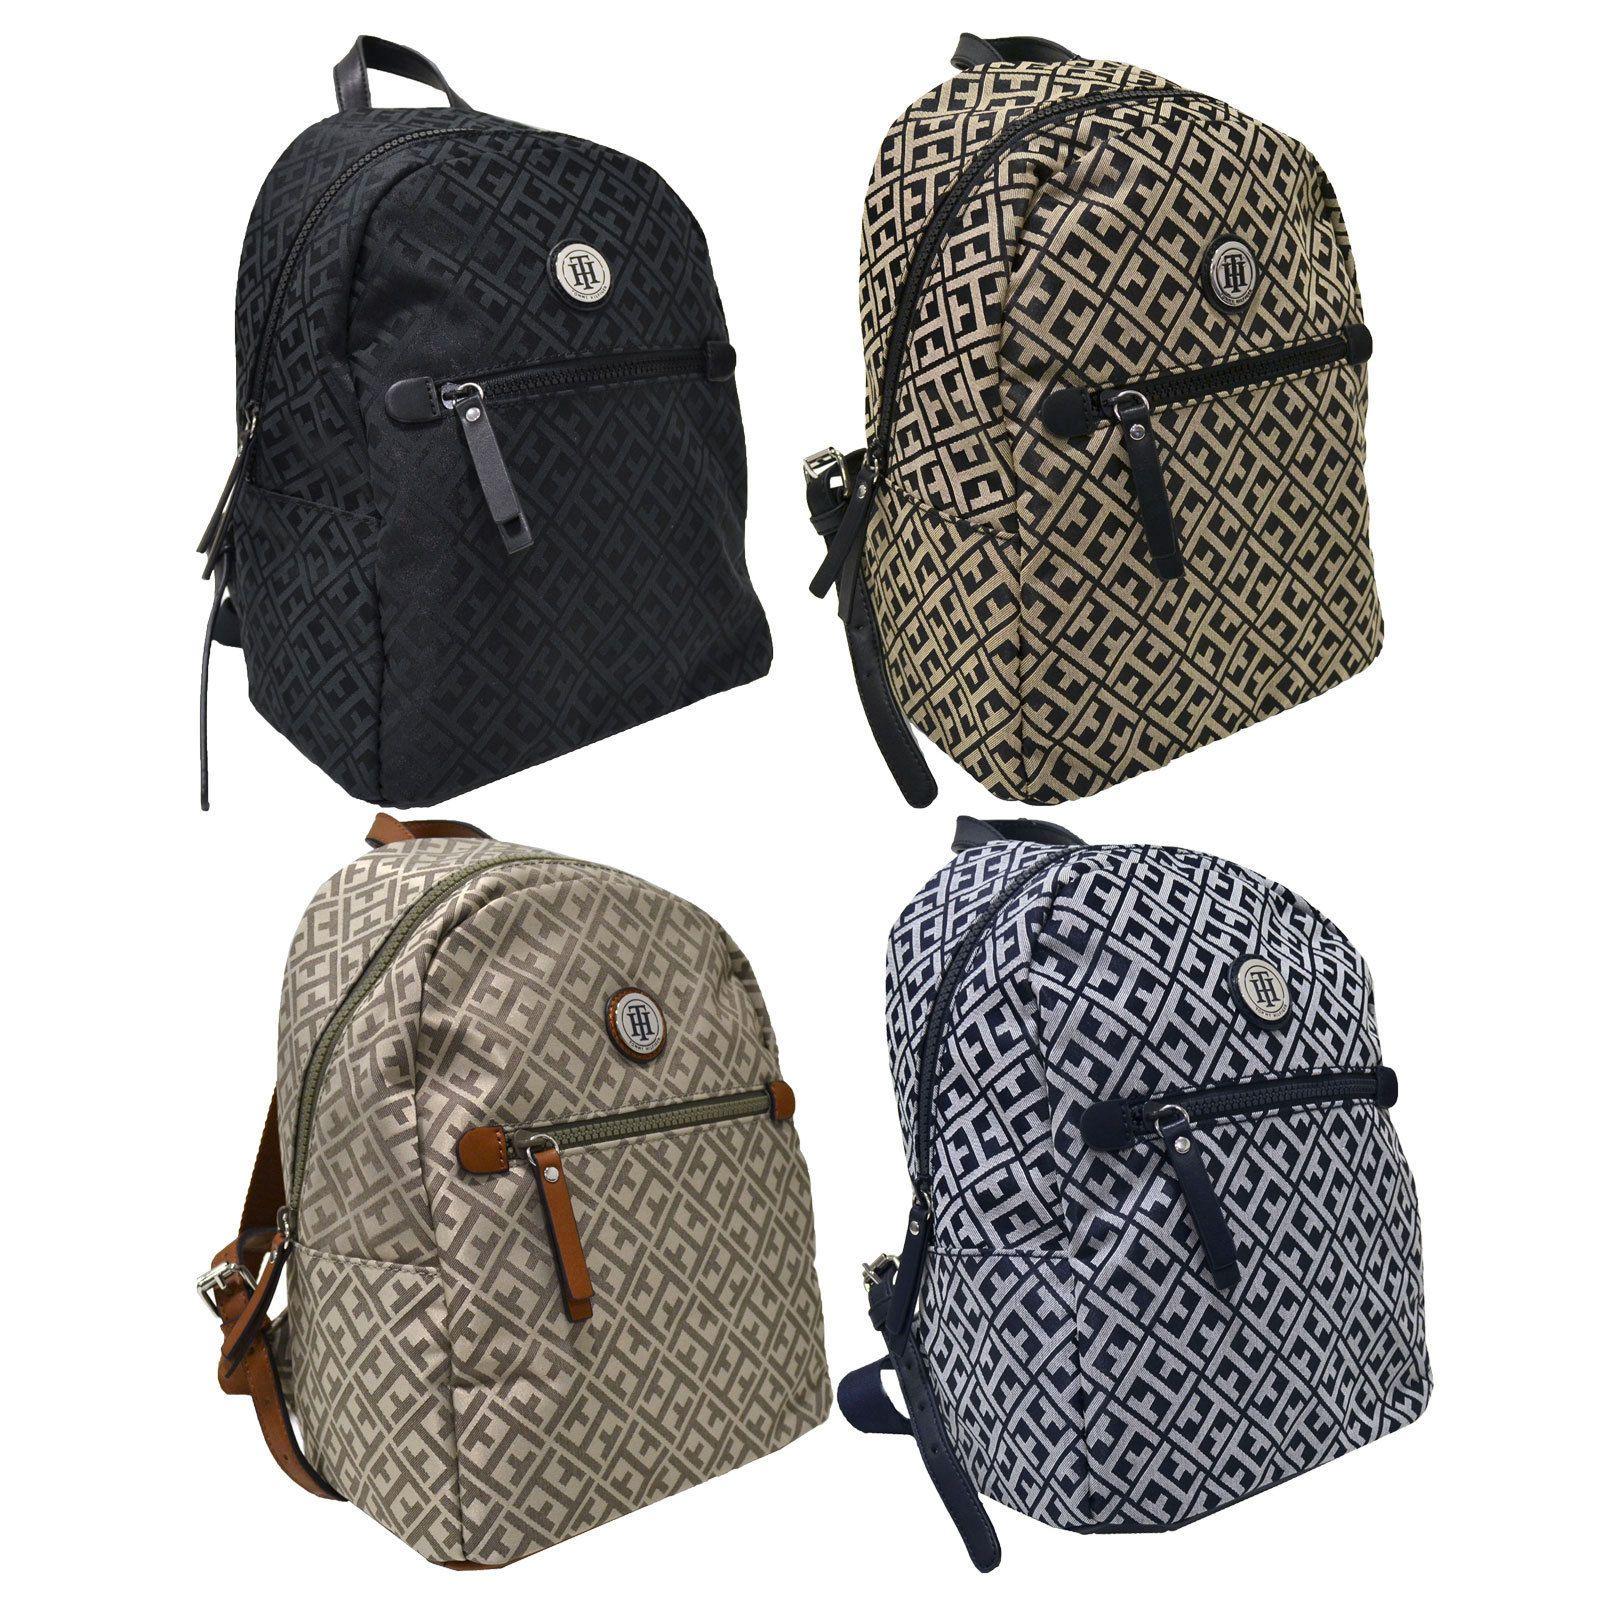 8235c10b1b tommy hilfiger backpack women s